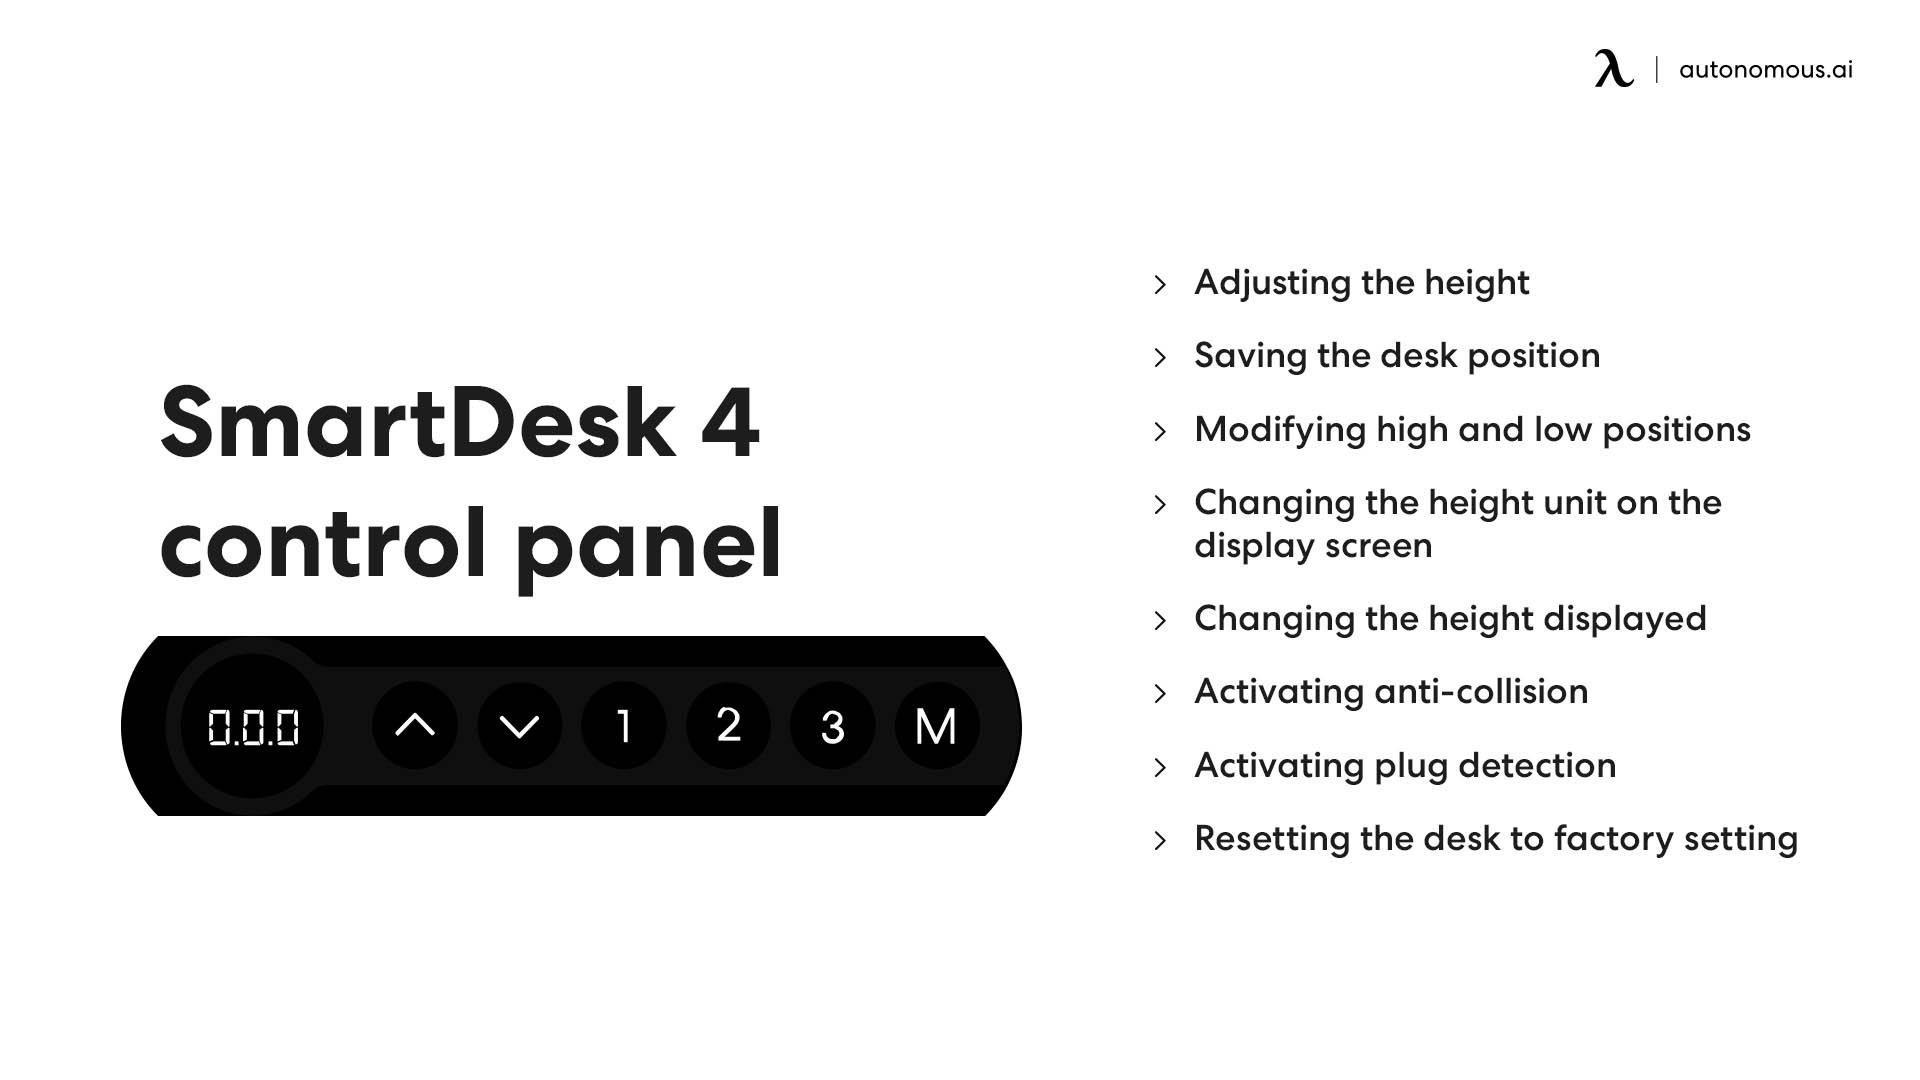 SmartDesk 4 control panel